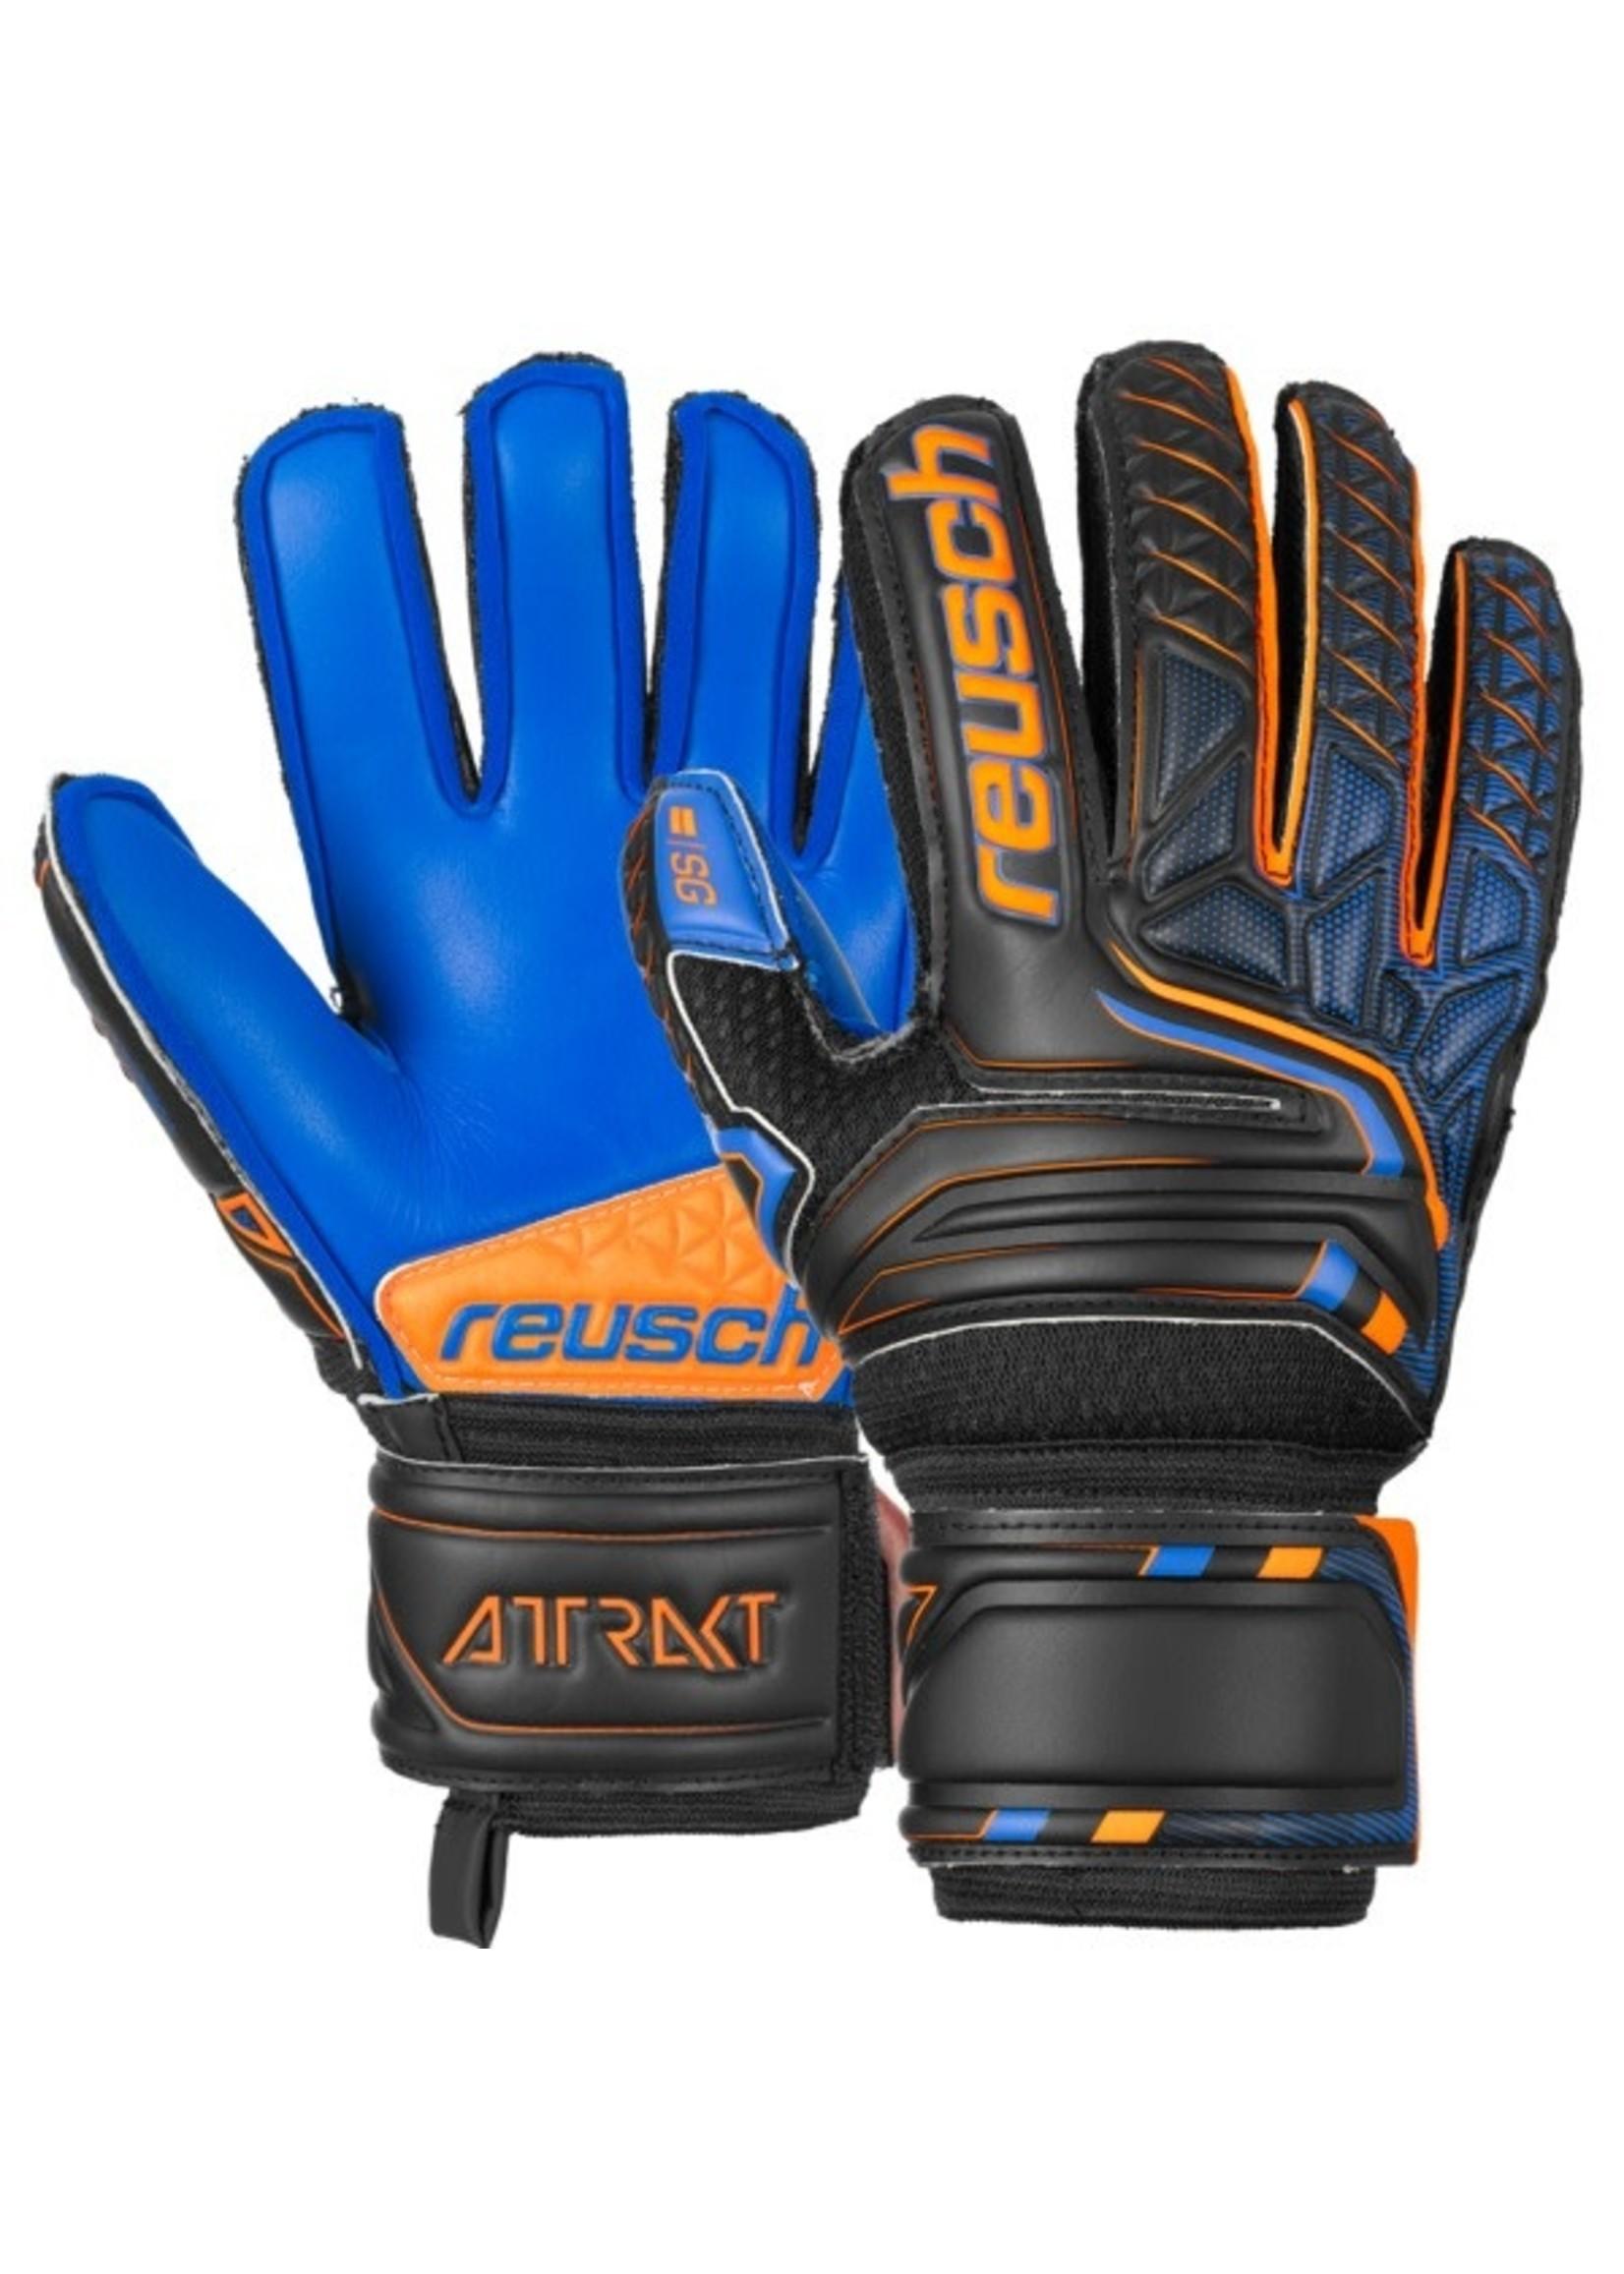 Reusch Attrakt SG Extra Finger Support Junior